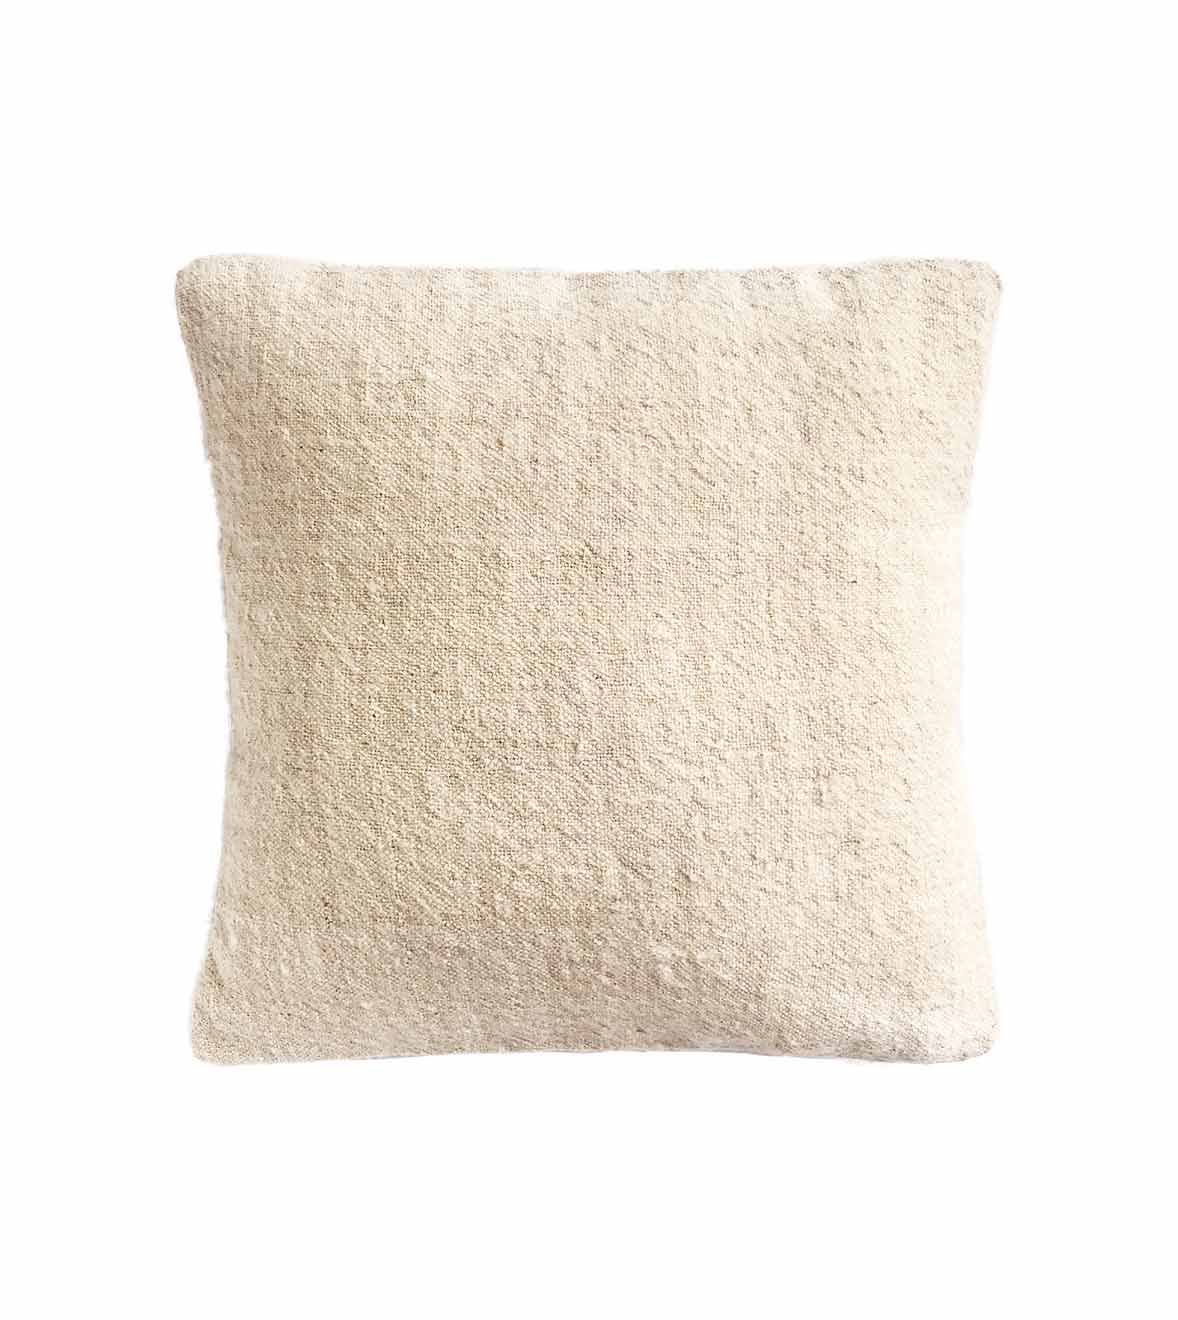 umlil cushion cover